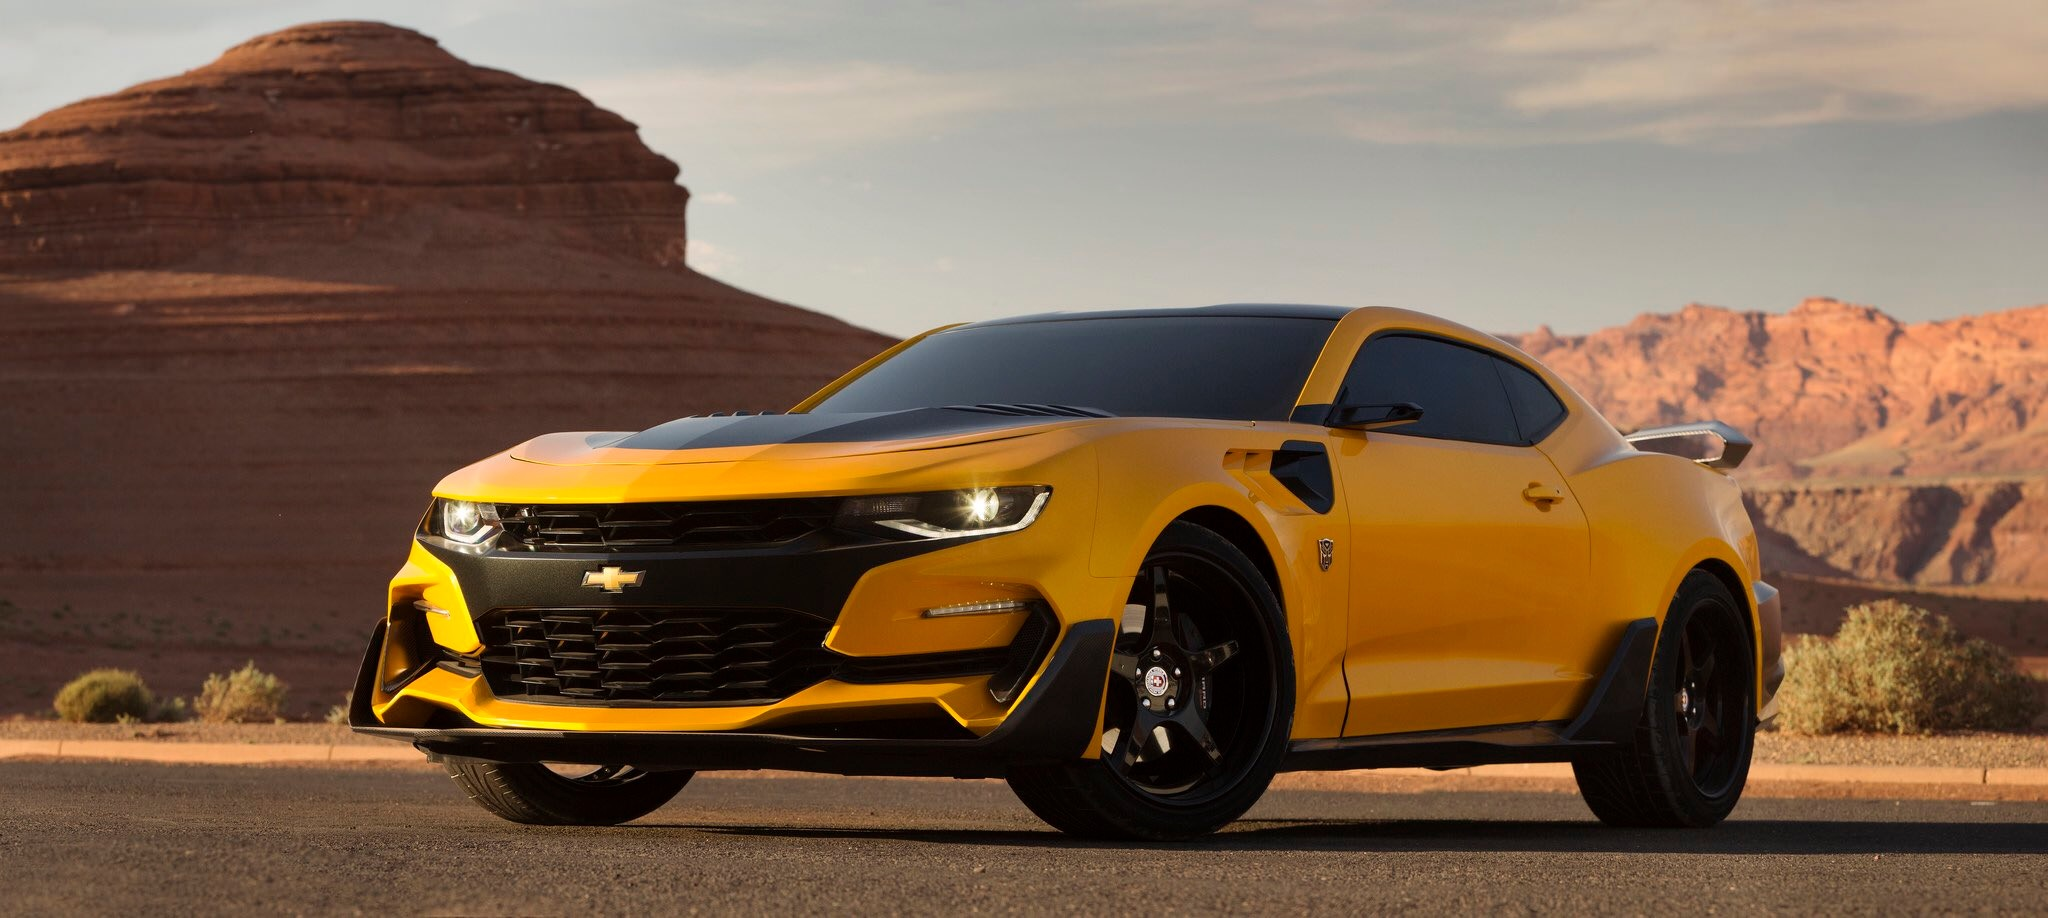 Transformers 5 Chevrolet Camaro Bumblebee 2016